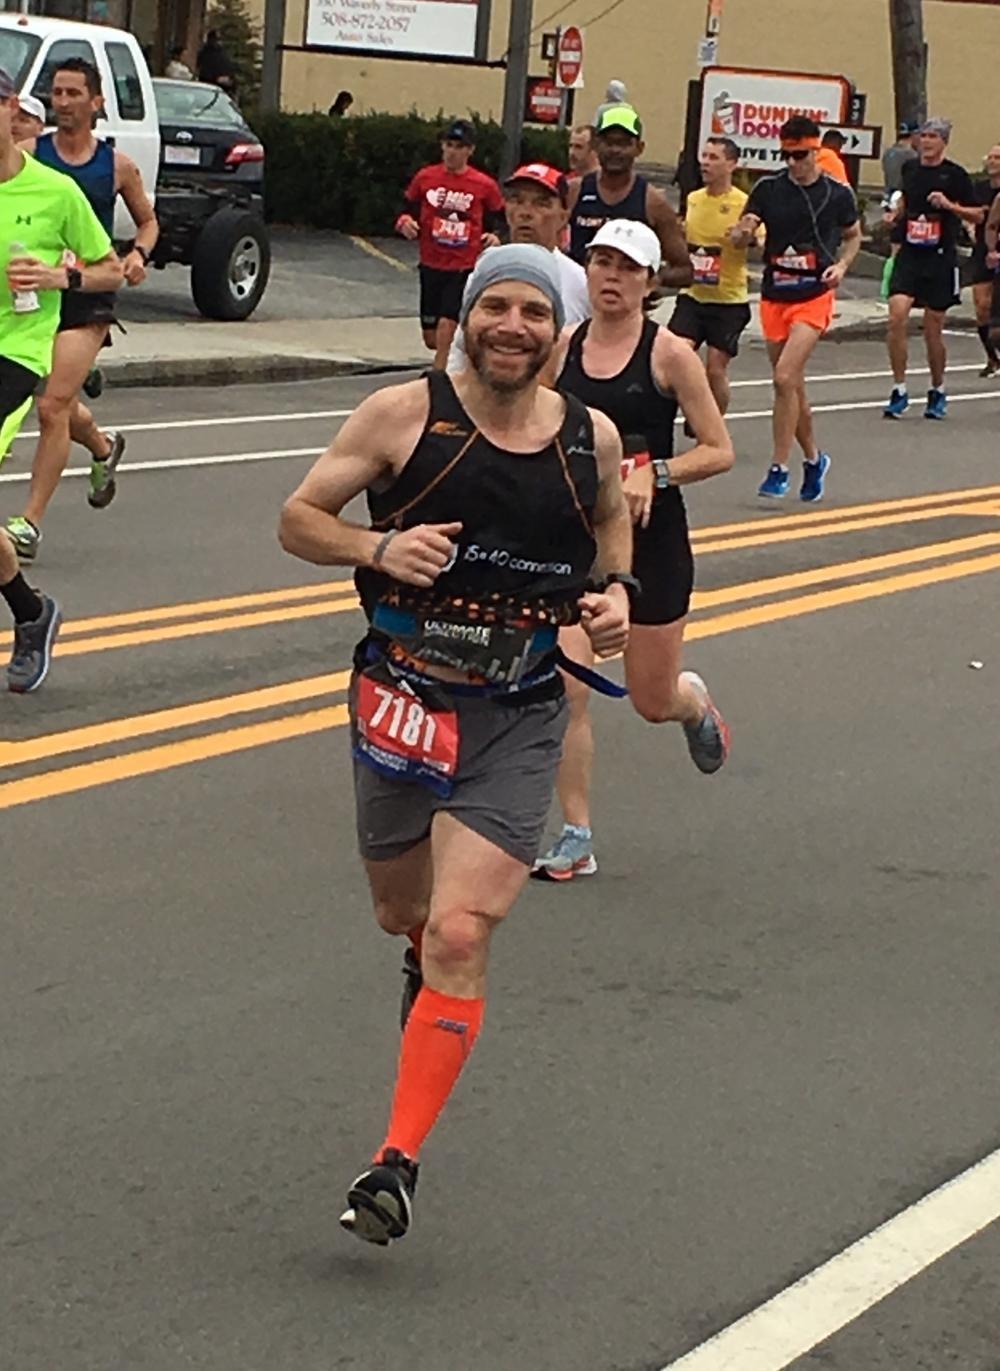 Neil Running